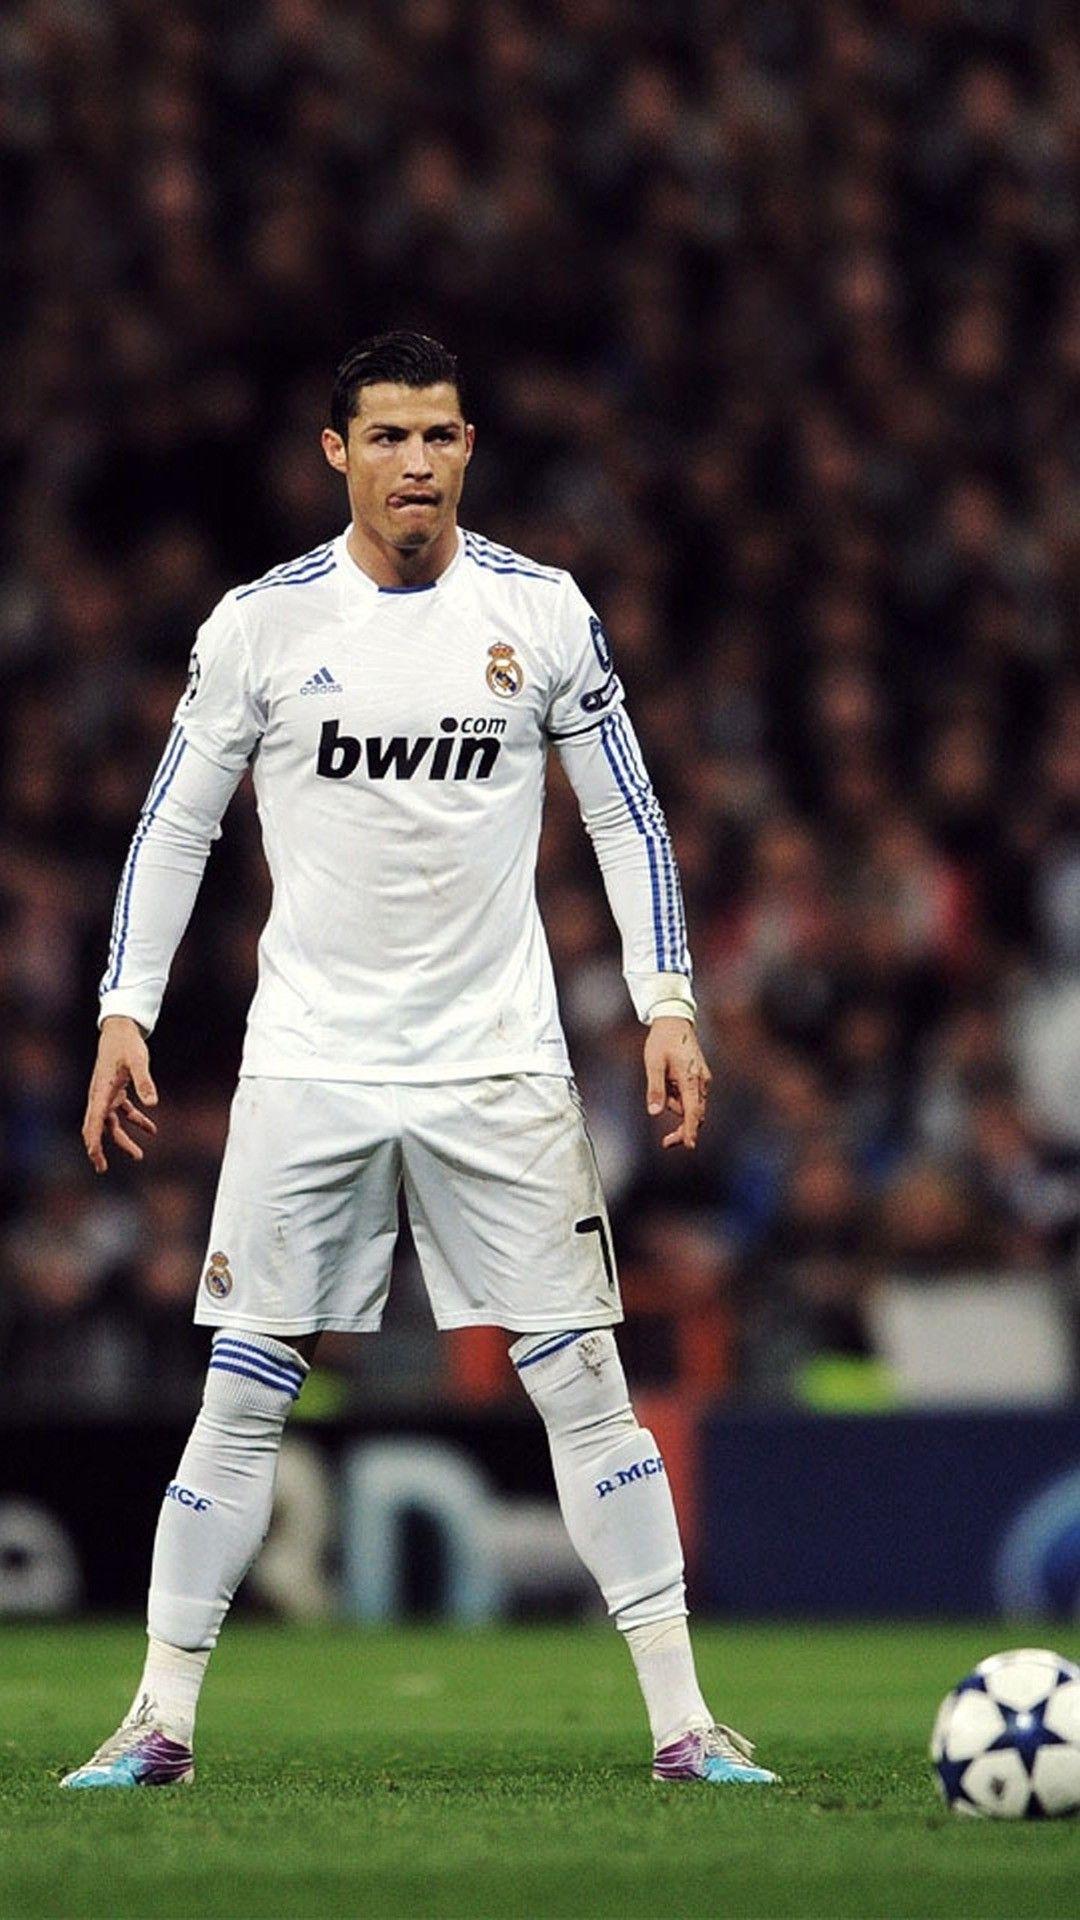 Hình nền HD 1080x1920 Cristiano Ronaldo